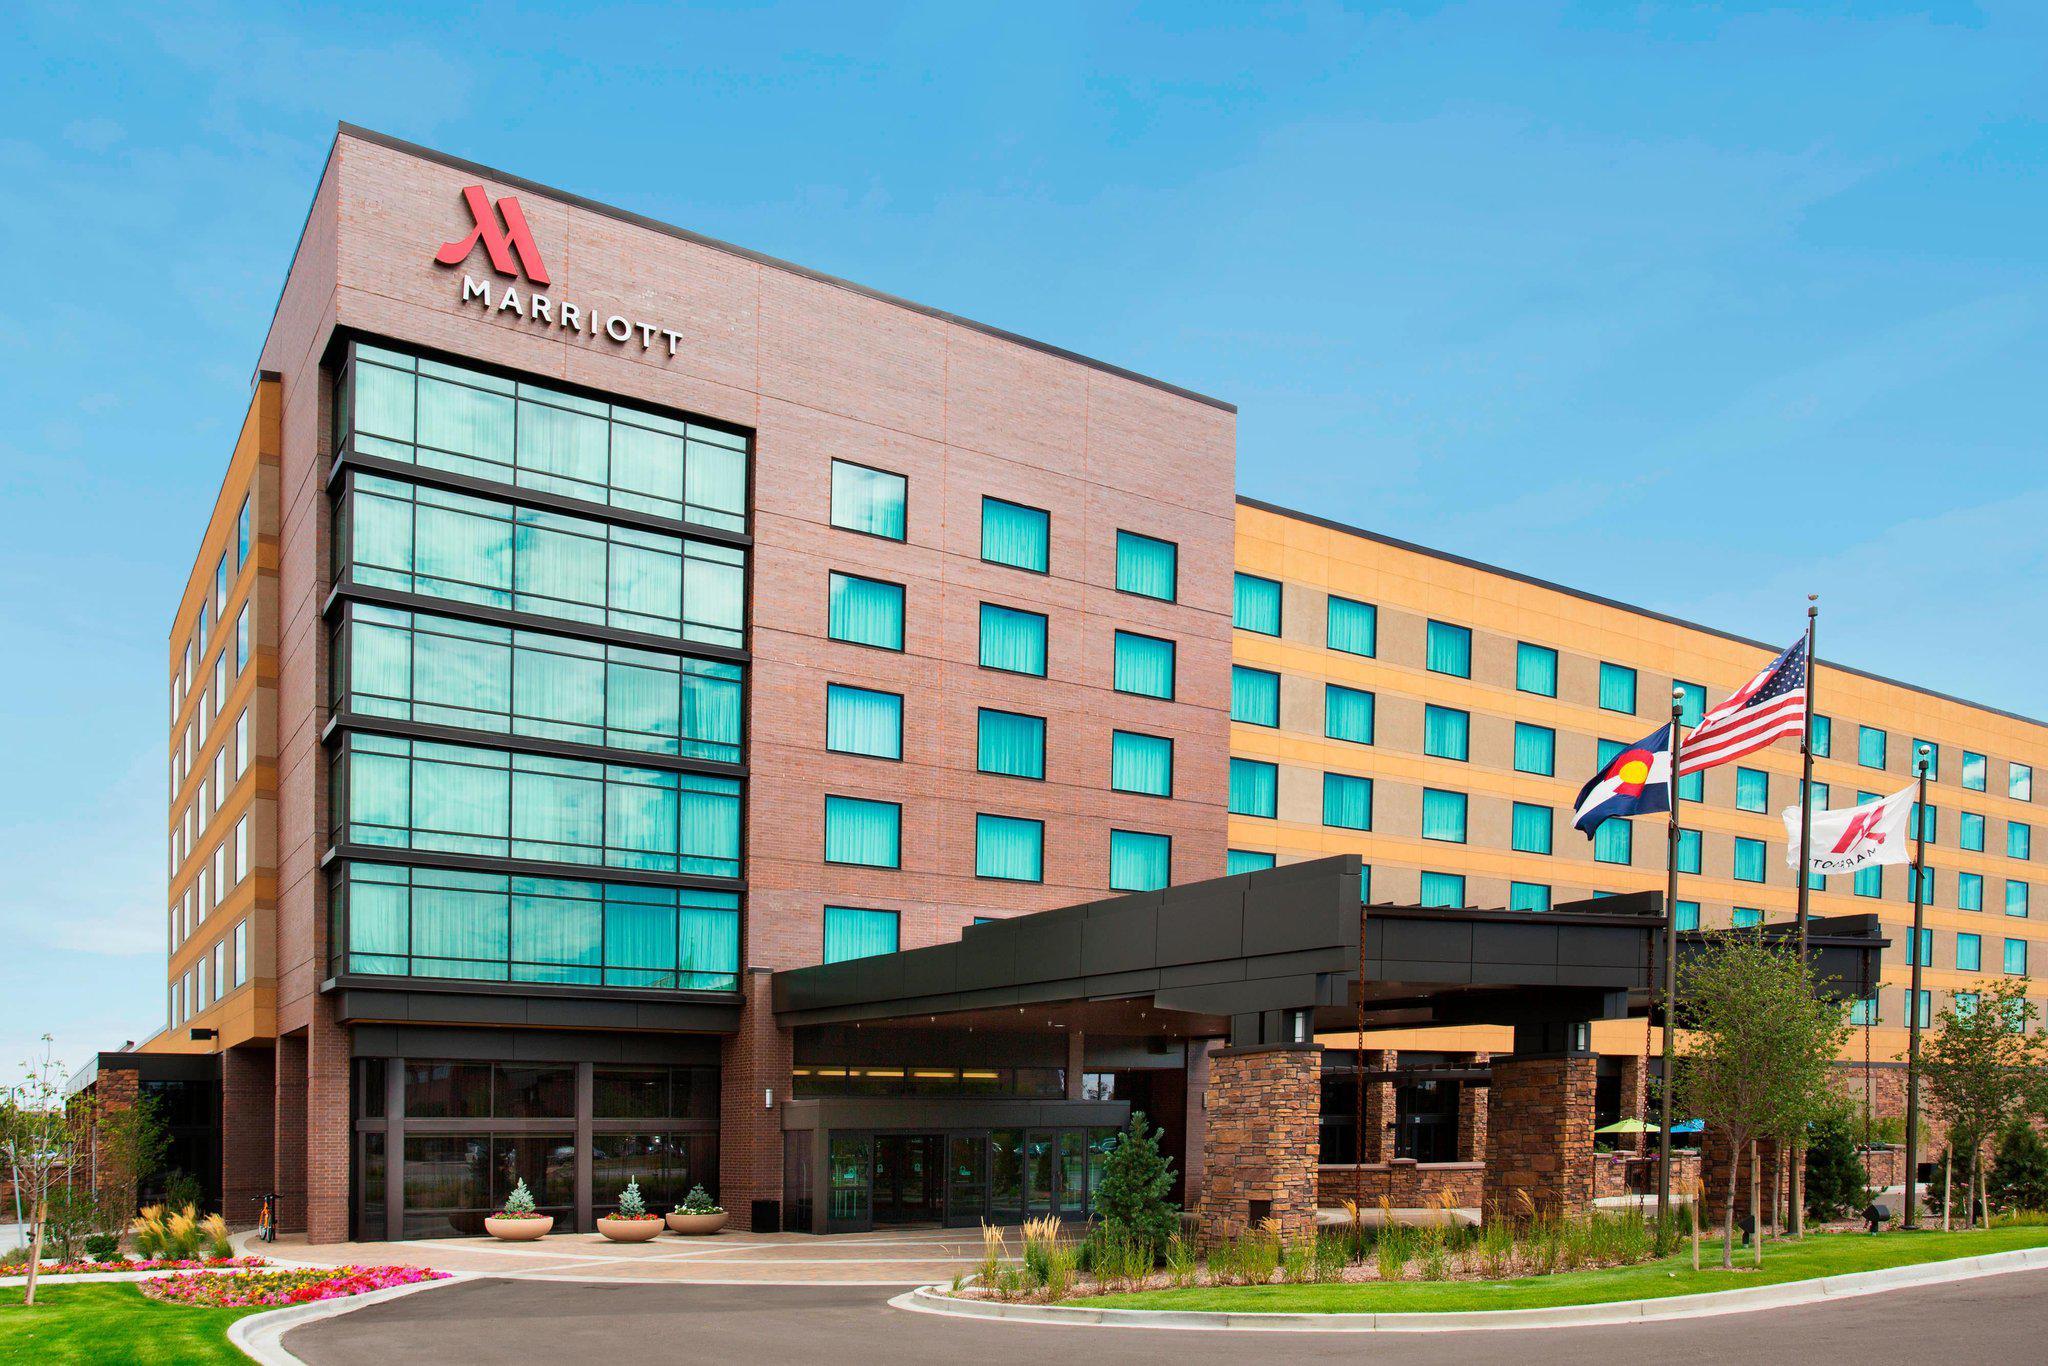 Denver Marriott Westminster - OPEN